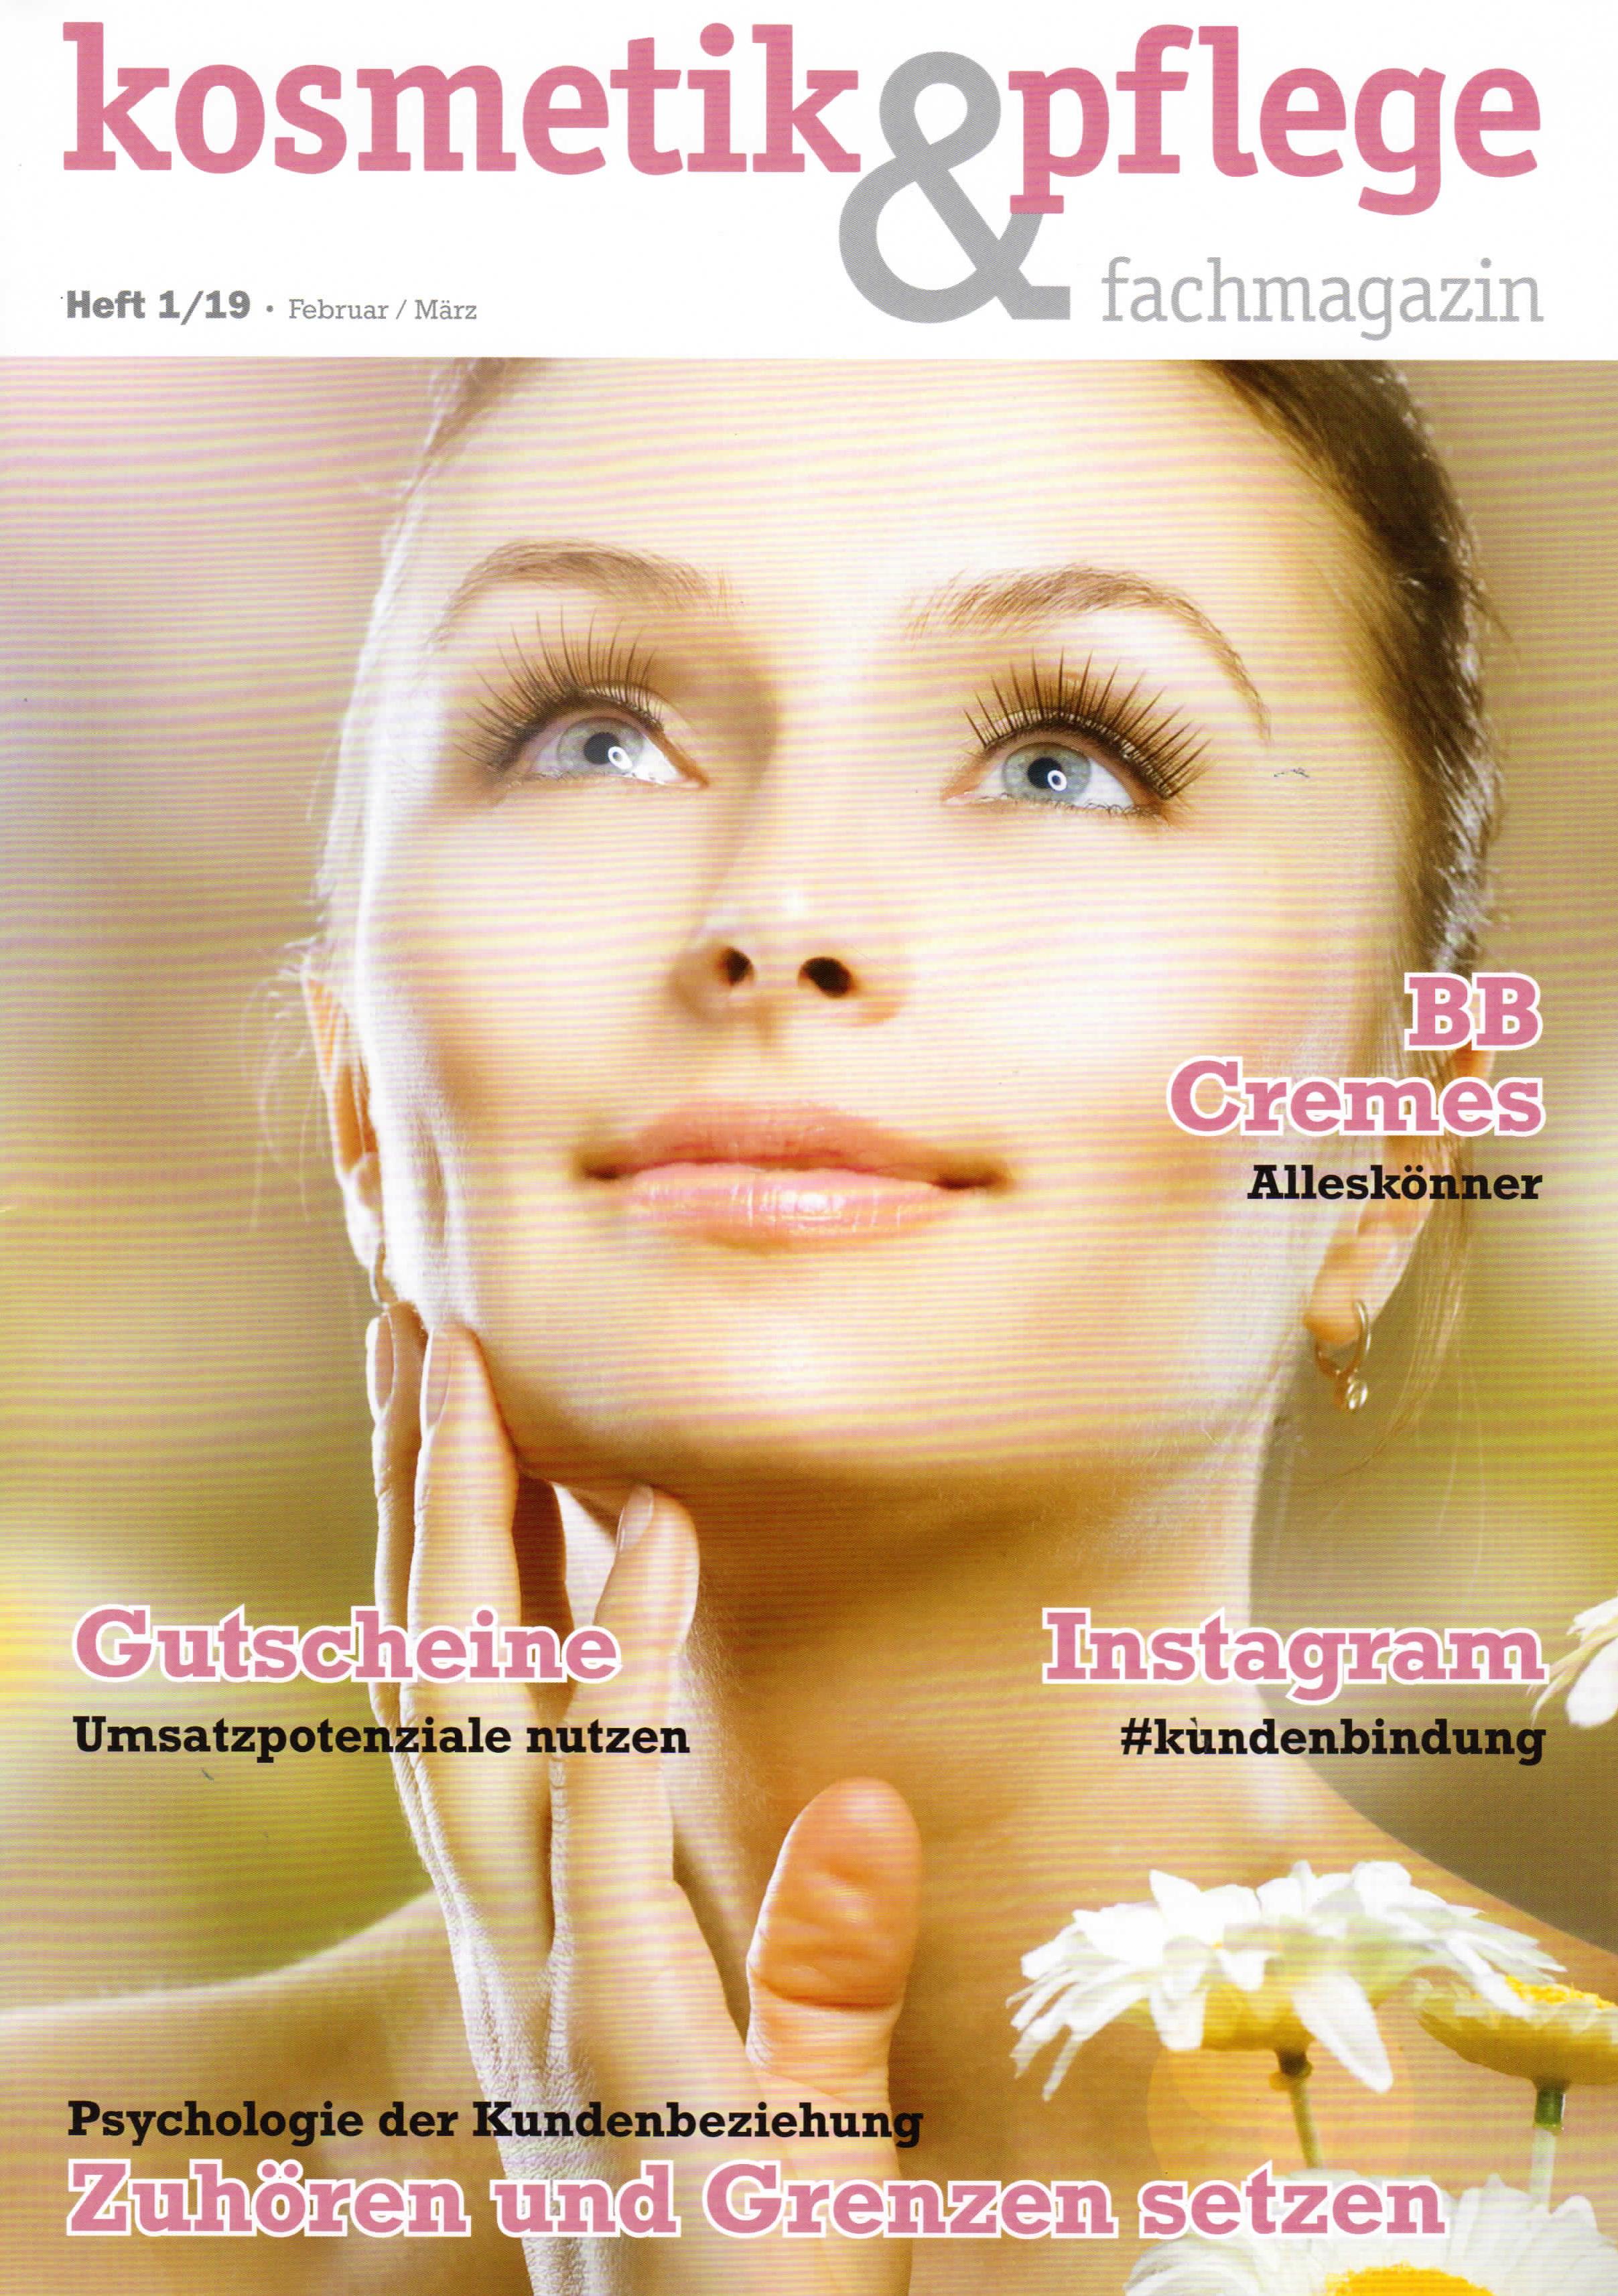 Detoxen mit Sofri, Kosmetik & Pflege im März 2019